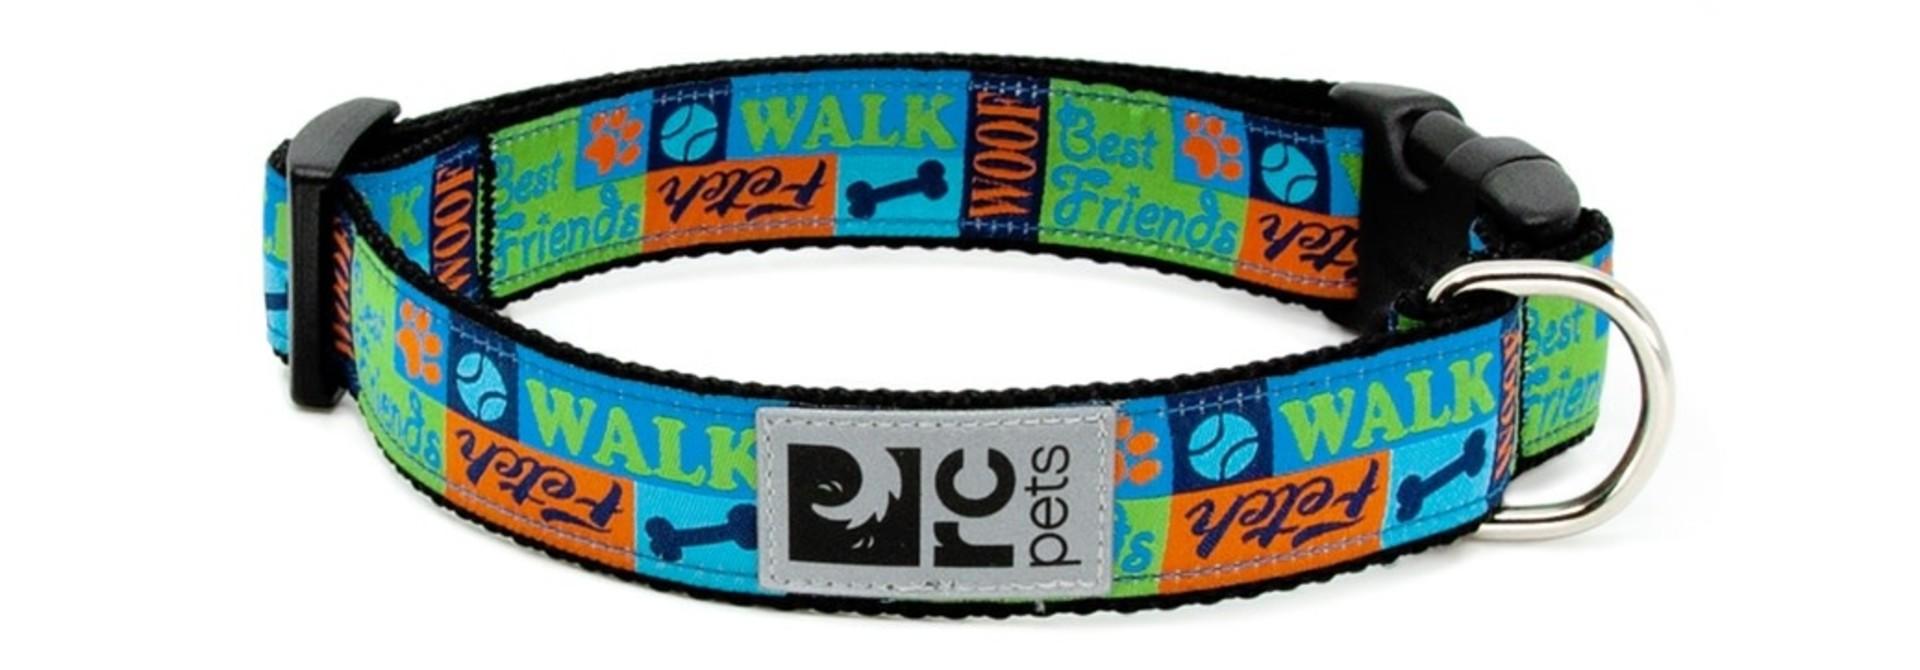 "Clip Collar Medium 1"" Best Friends"